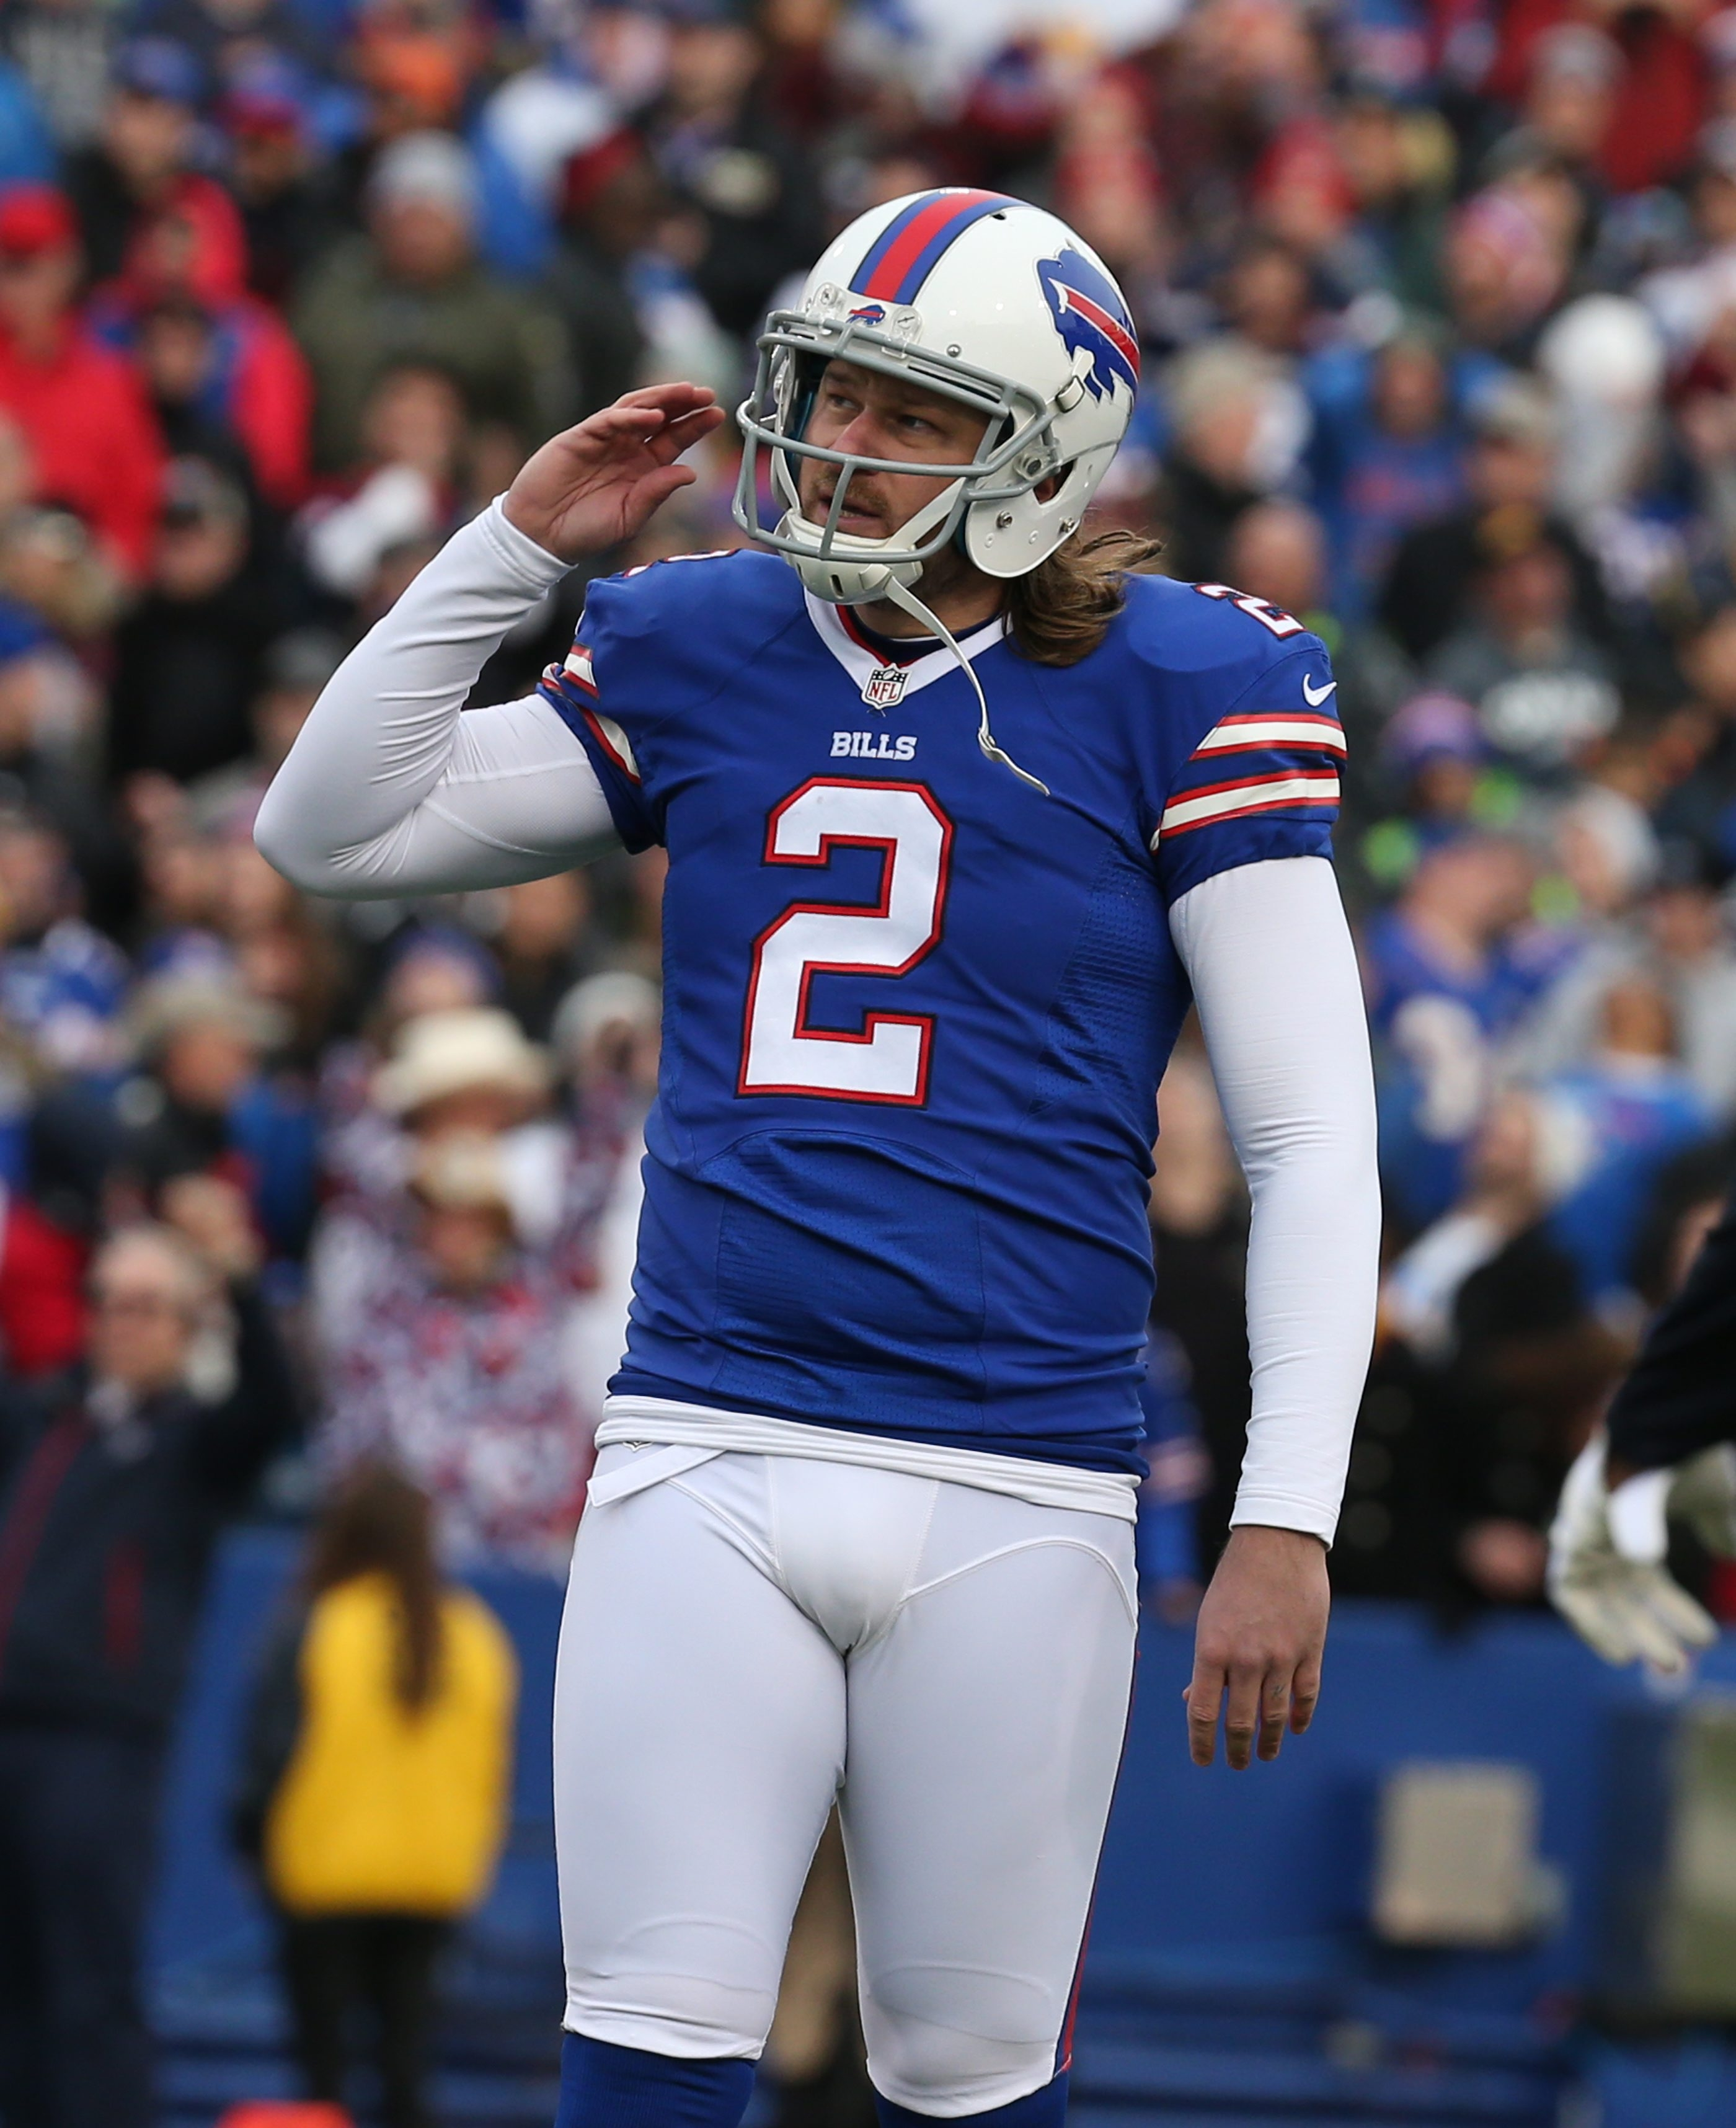 Bills kicker Dan Carpenter missed a field goal during the third quarter at Ralph Wilson Stadium on Sunday.